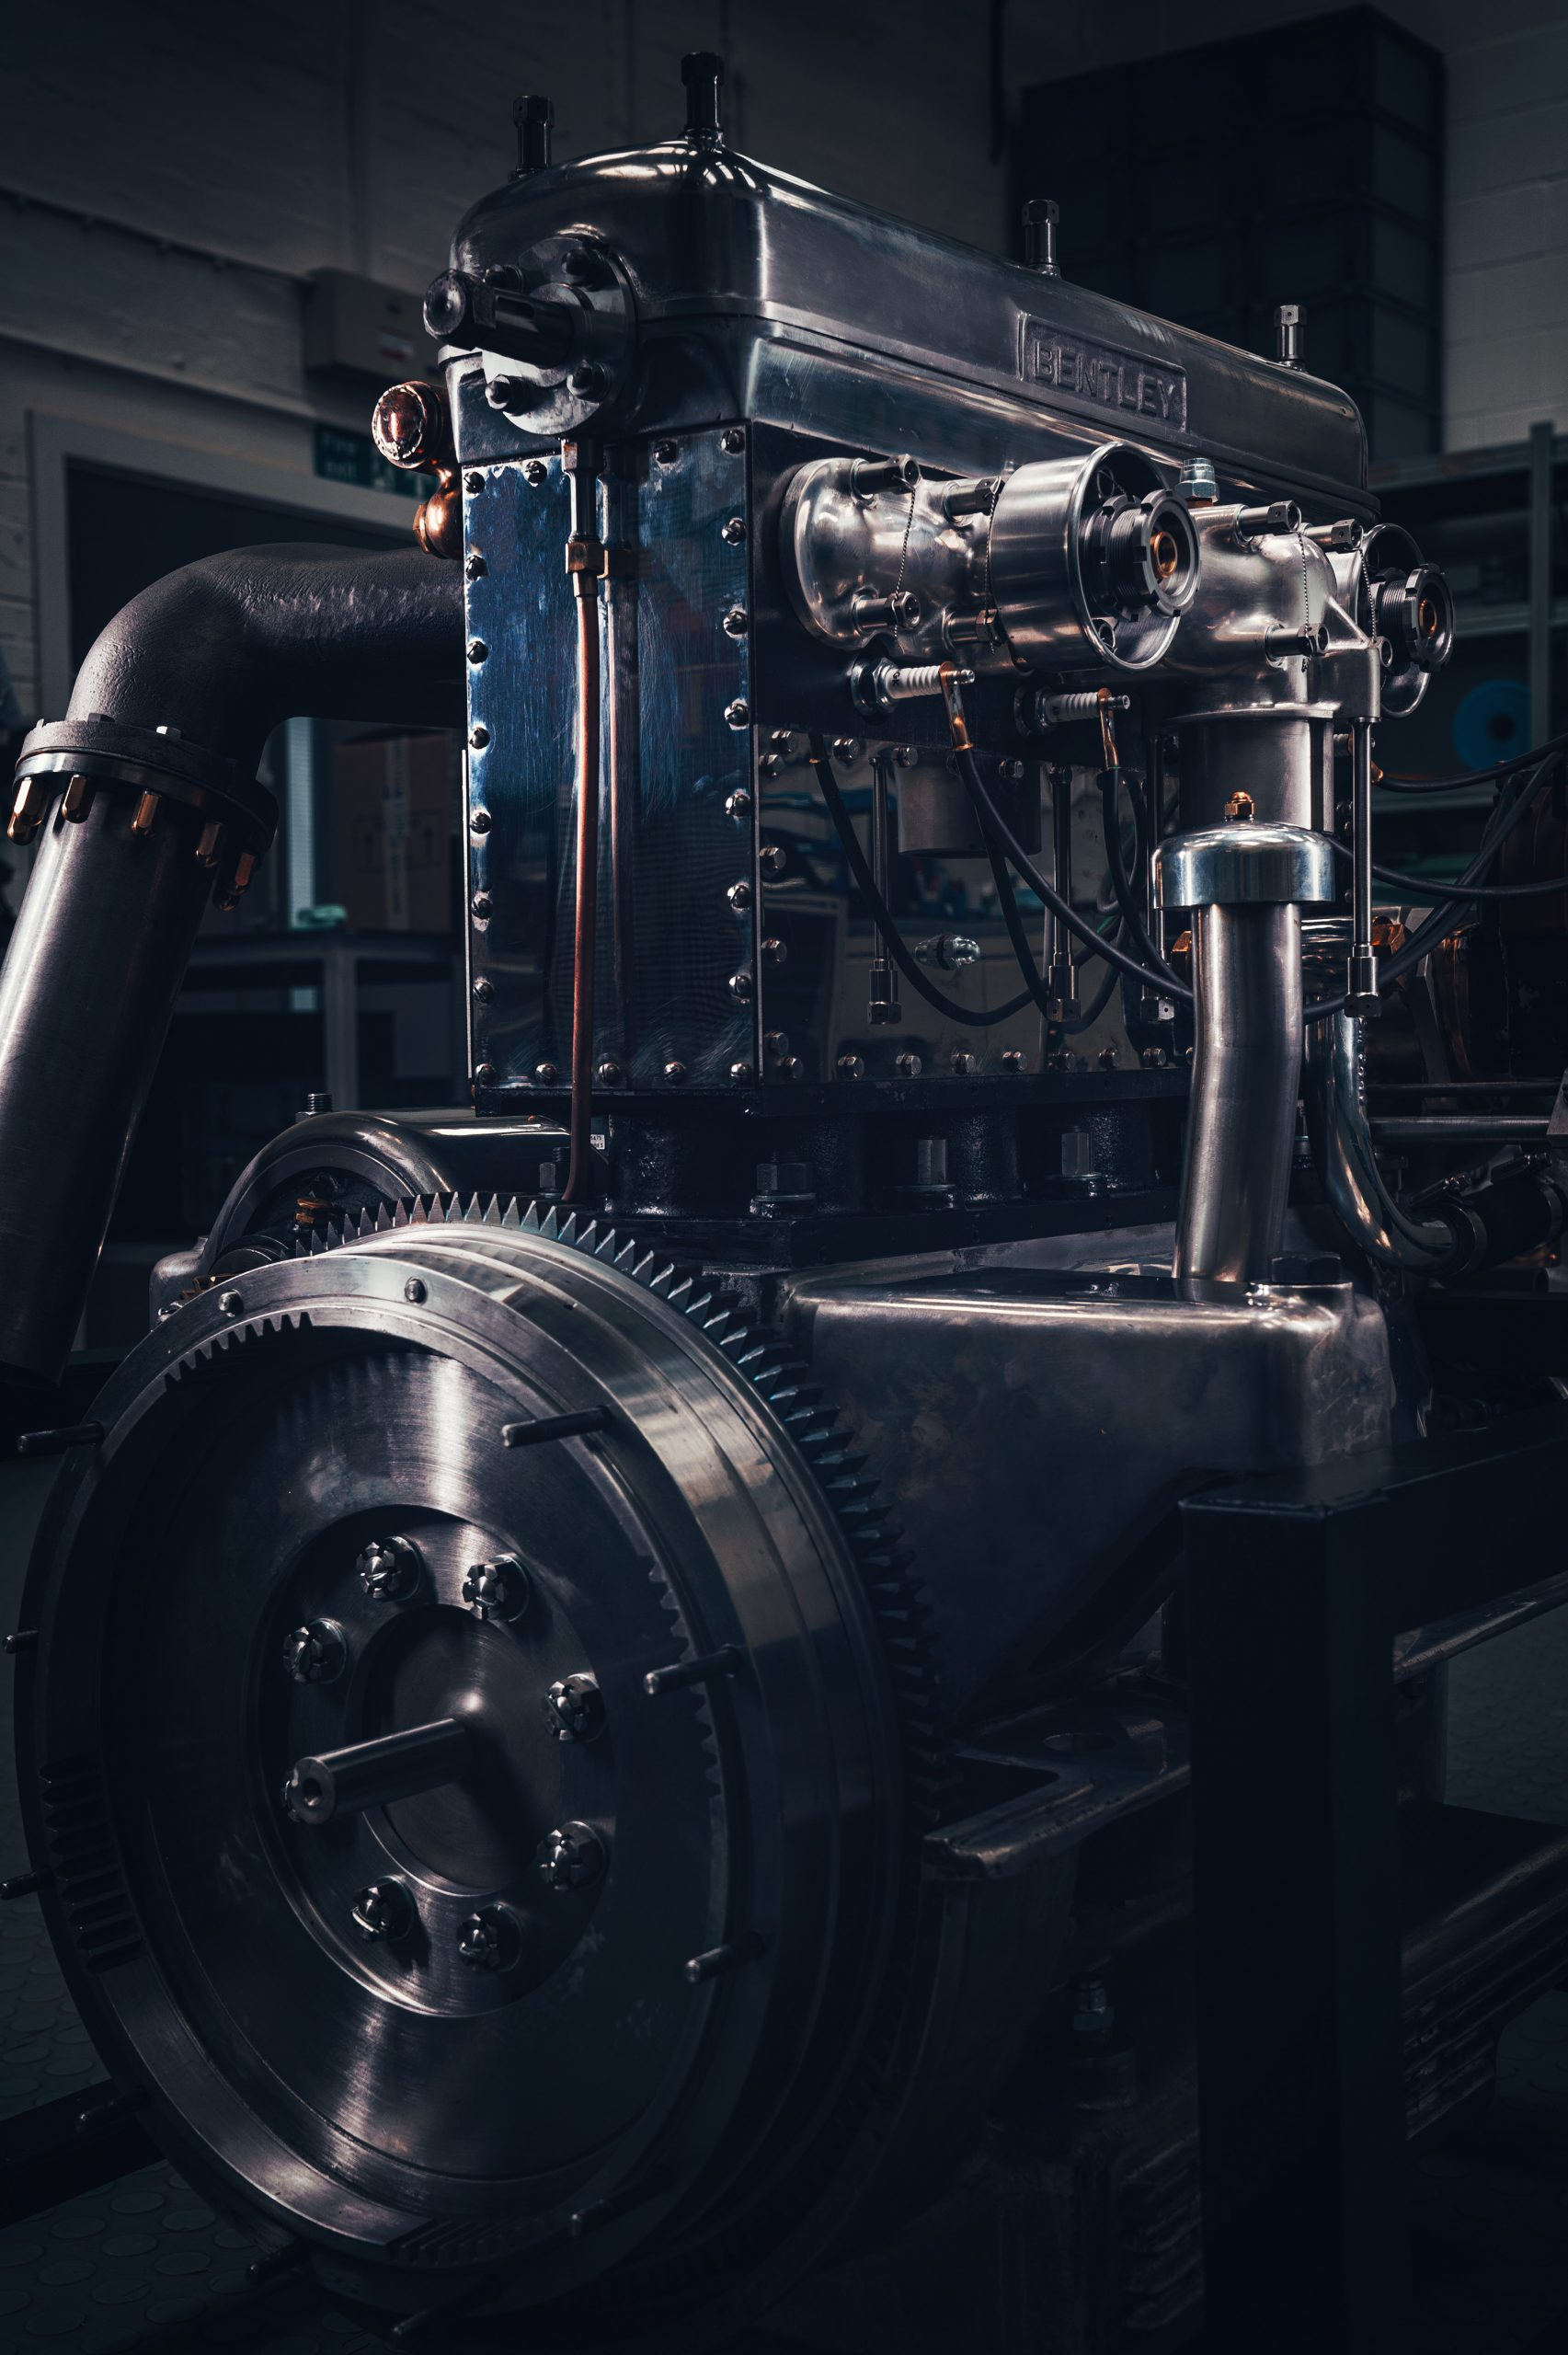 bentley blower continuation engine front three-quarter